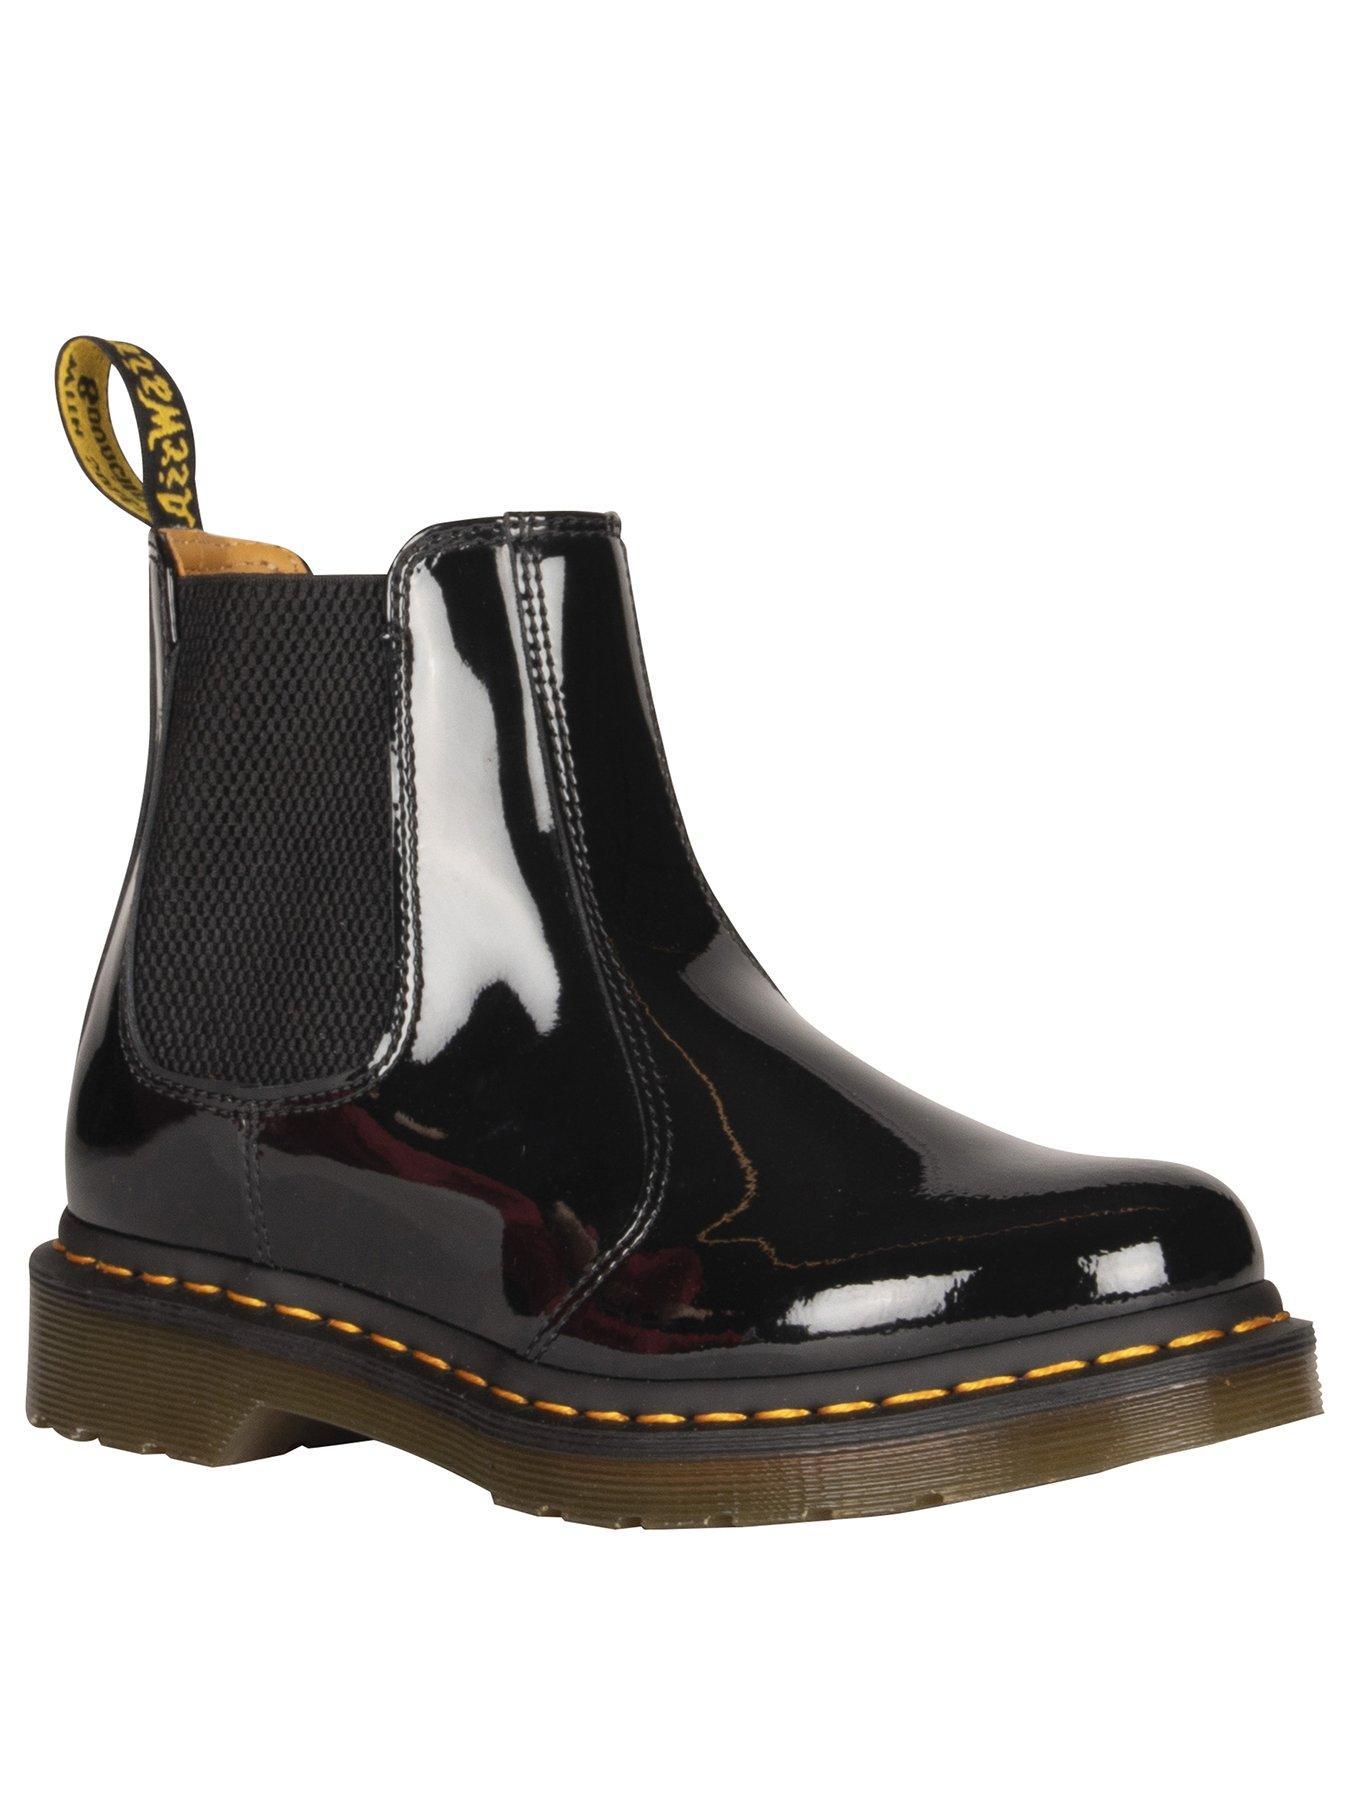 Dr Martens | Dr Martens Boots | Very.co.uk